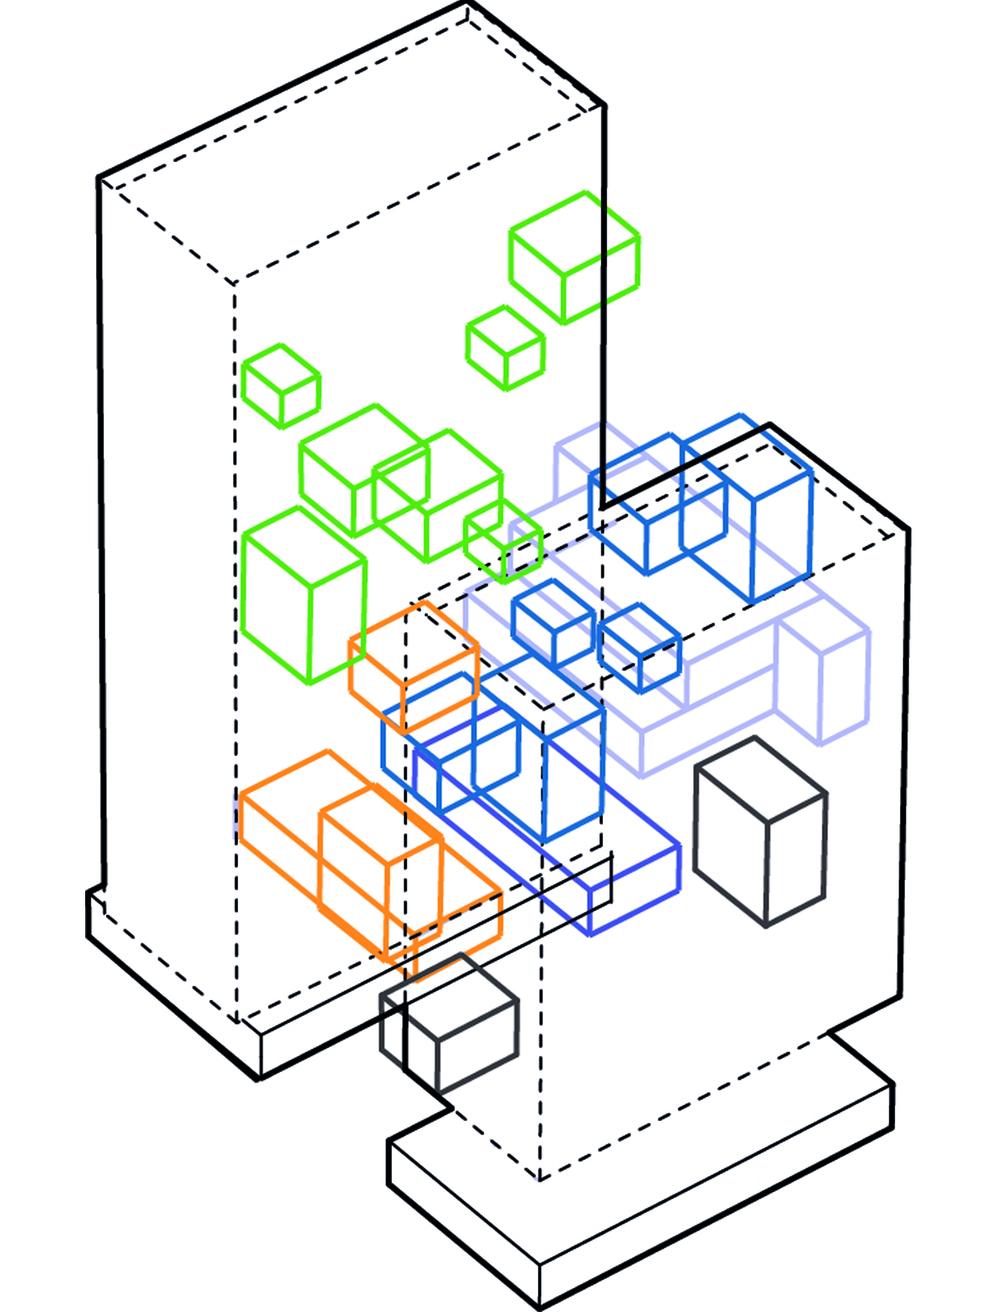 pulltowers-sectiondiagram03.jpg